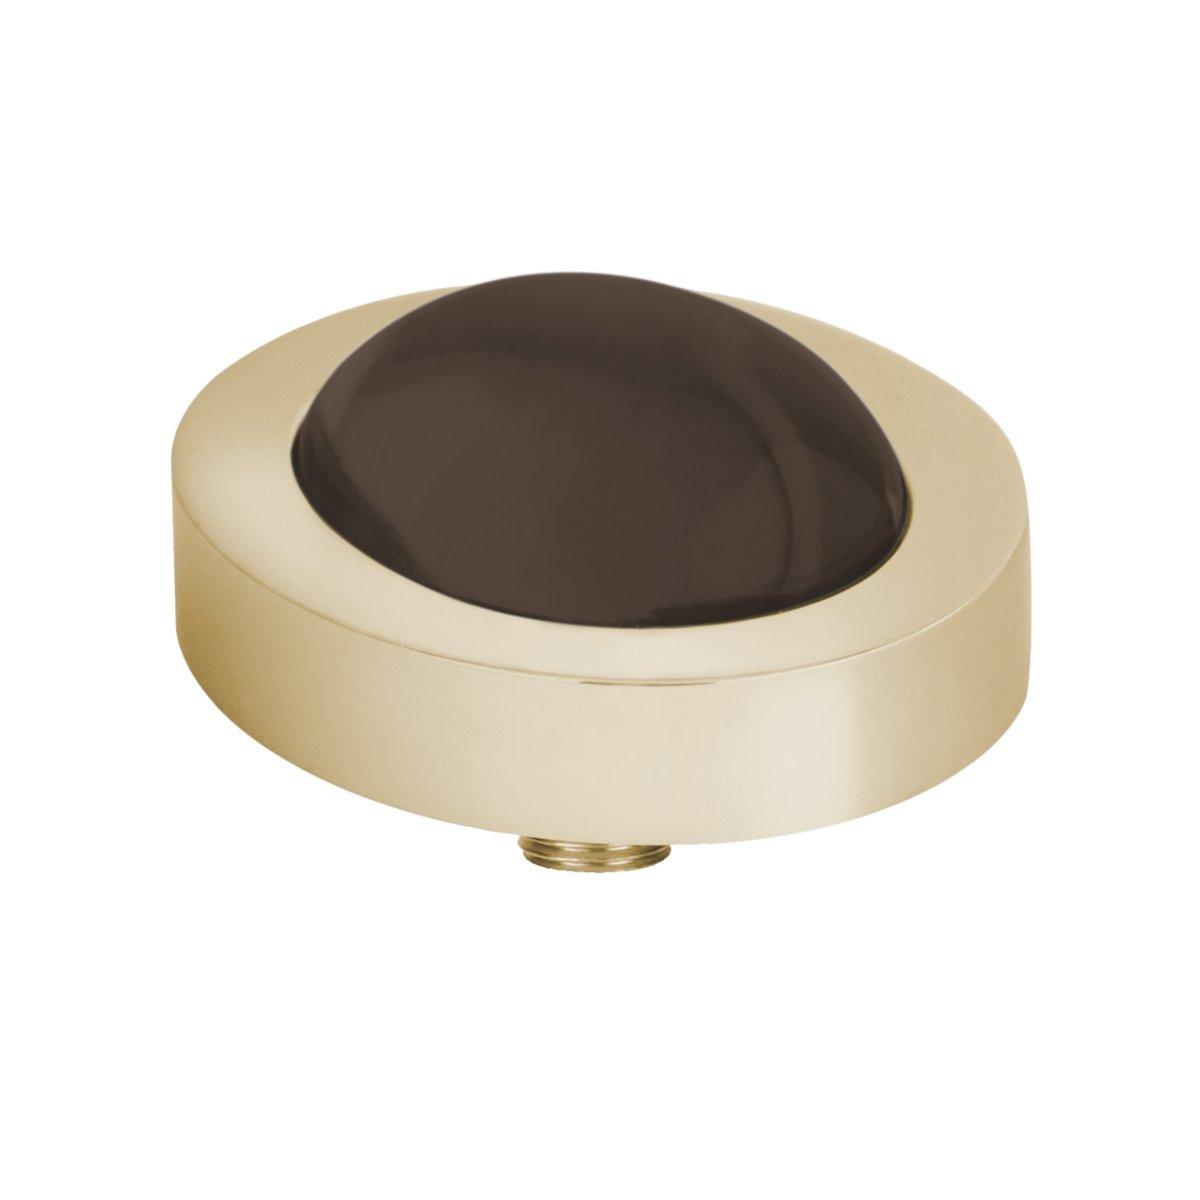 Melano vivid oval steentje - coffee - dames - goudkleurig - 10 mm kopen